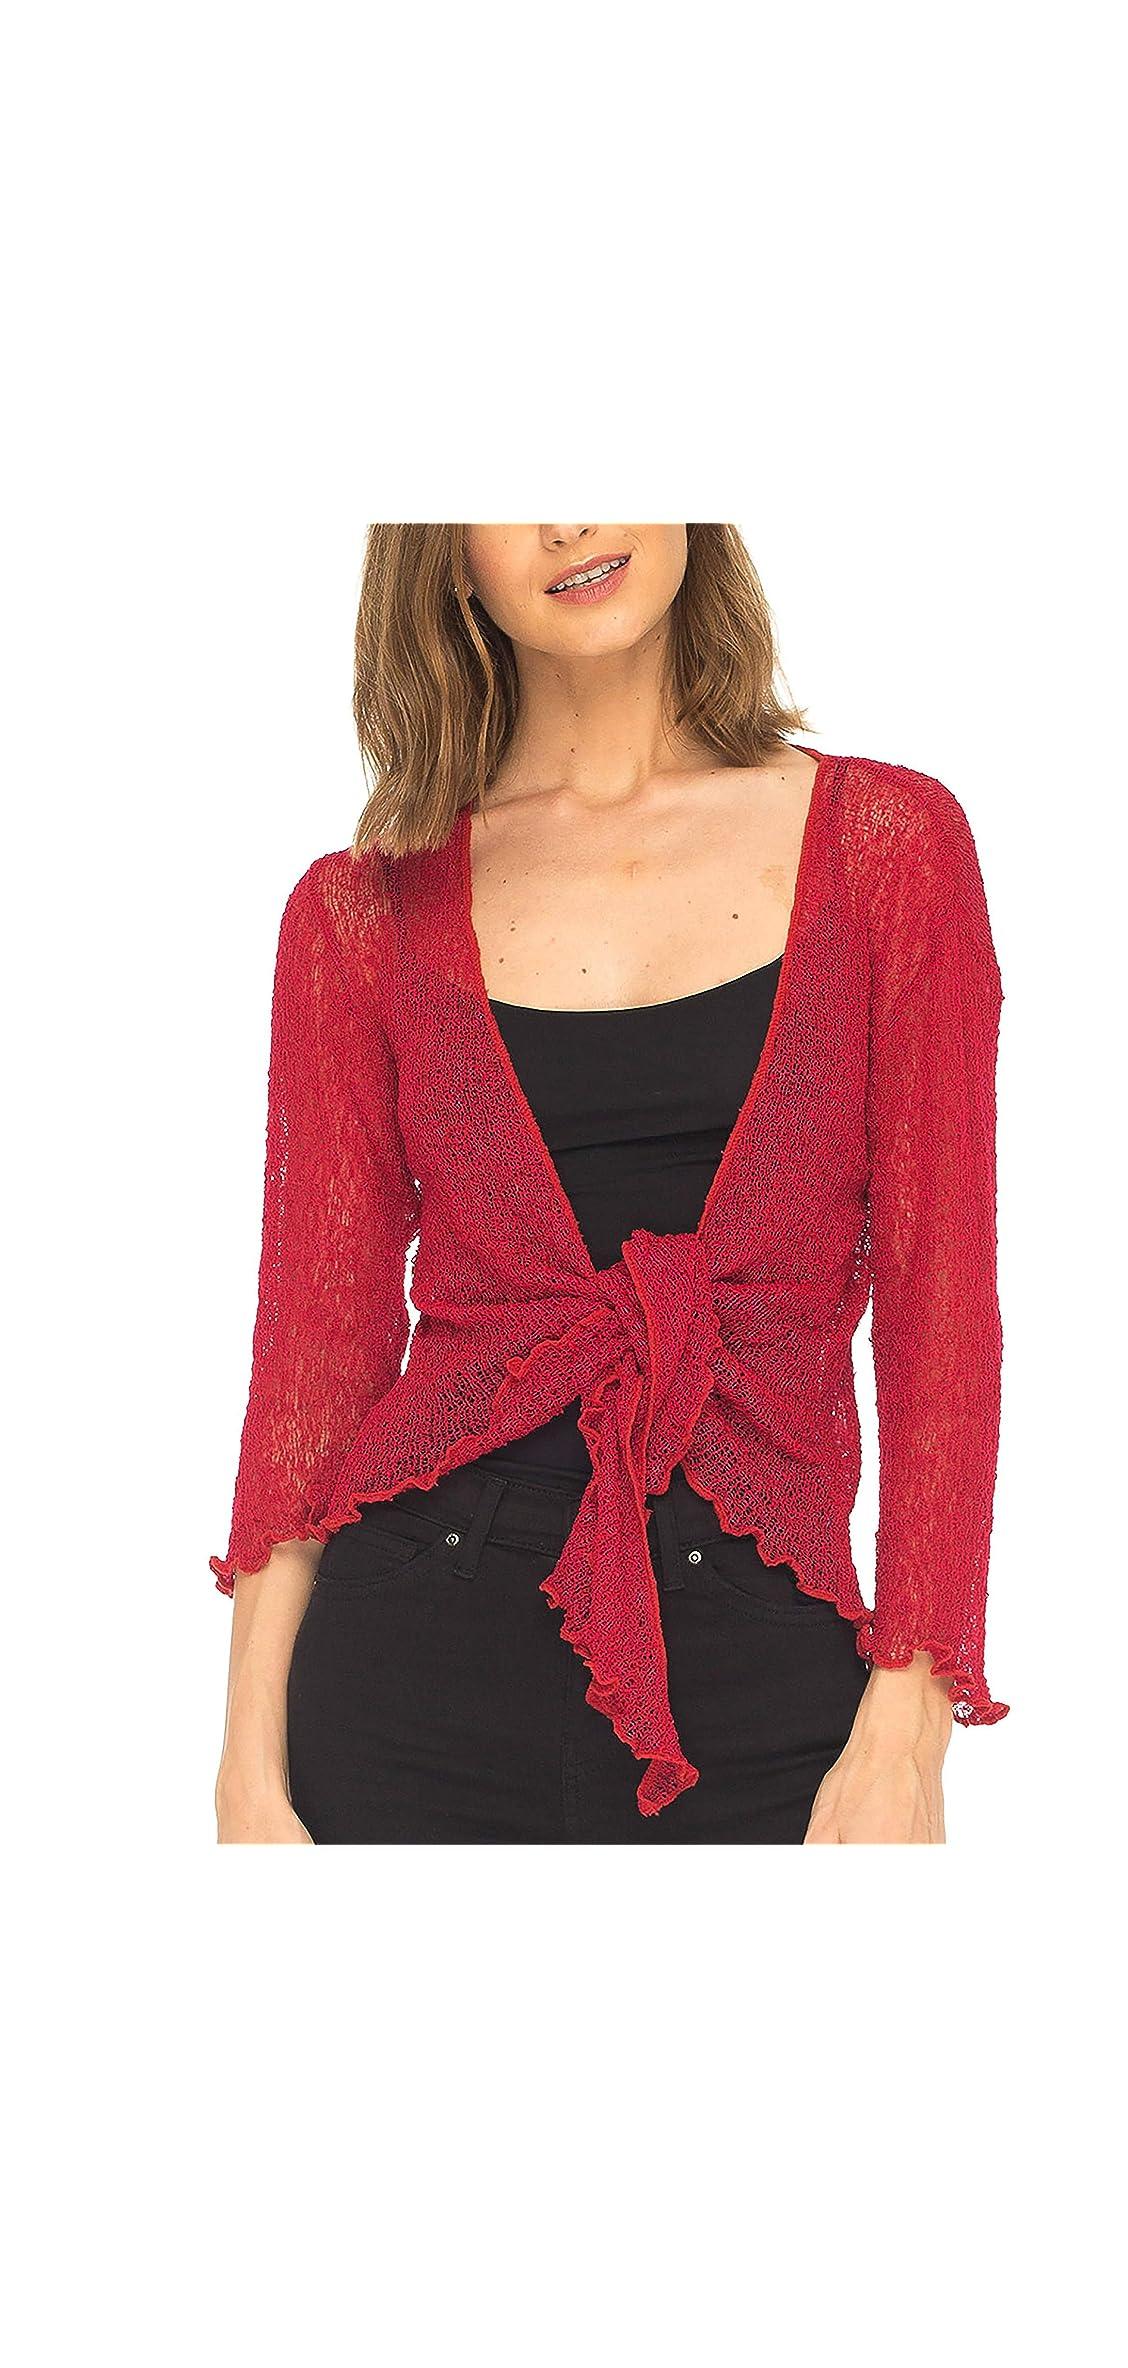 Womens Sheer Shrug Tie Top Open Front Cardigan Knit